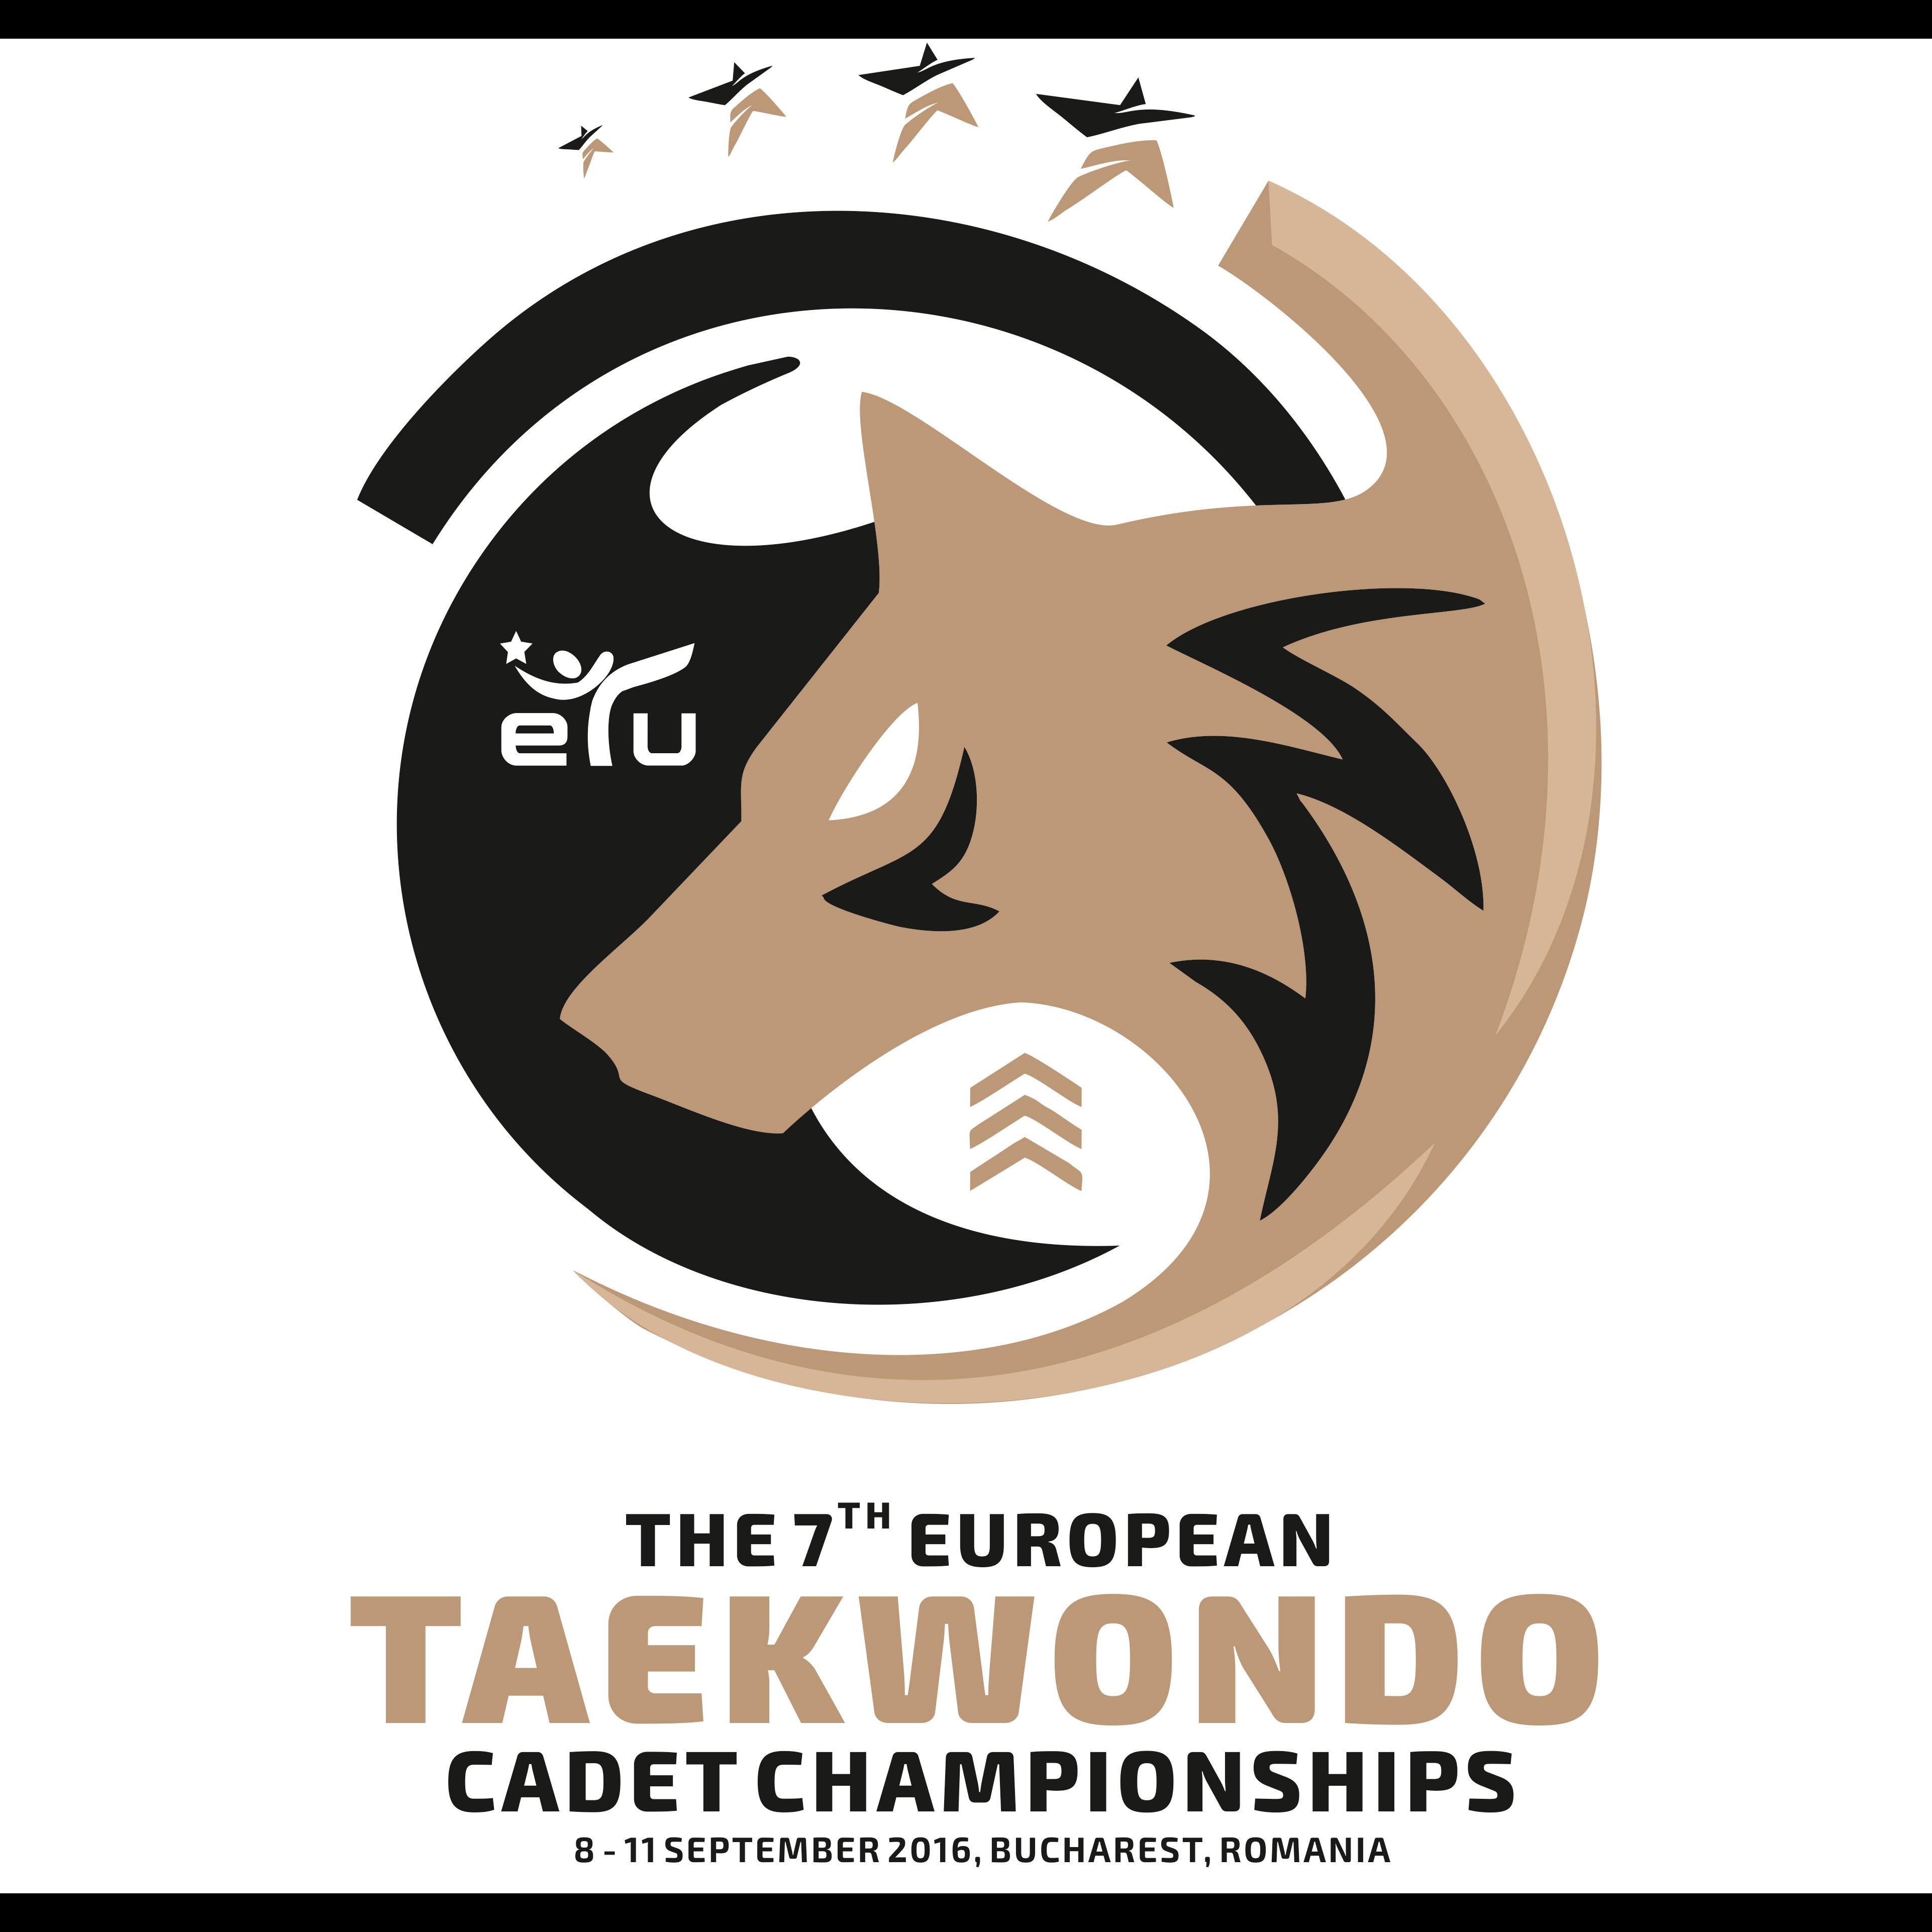 2016 European Taekwondo Cadet Championships